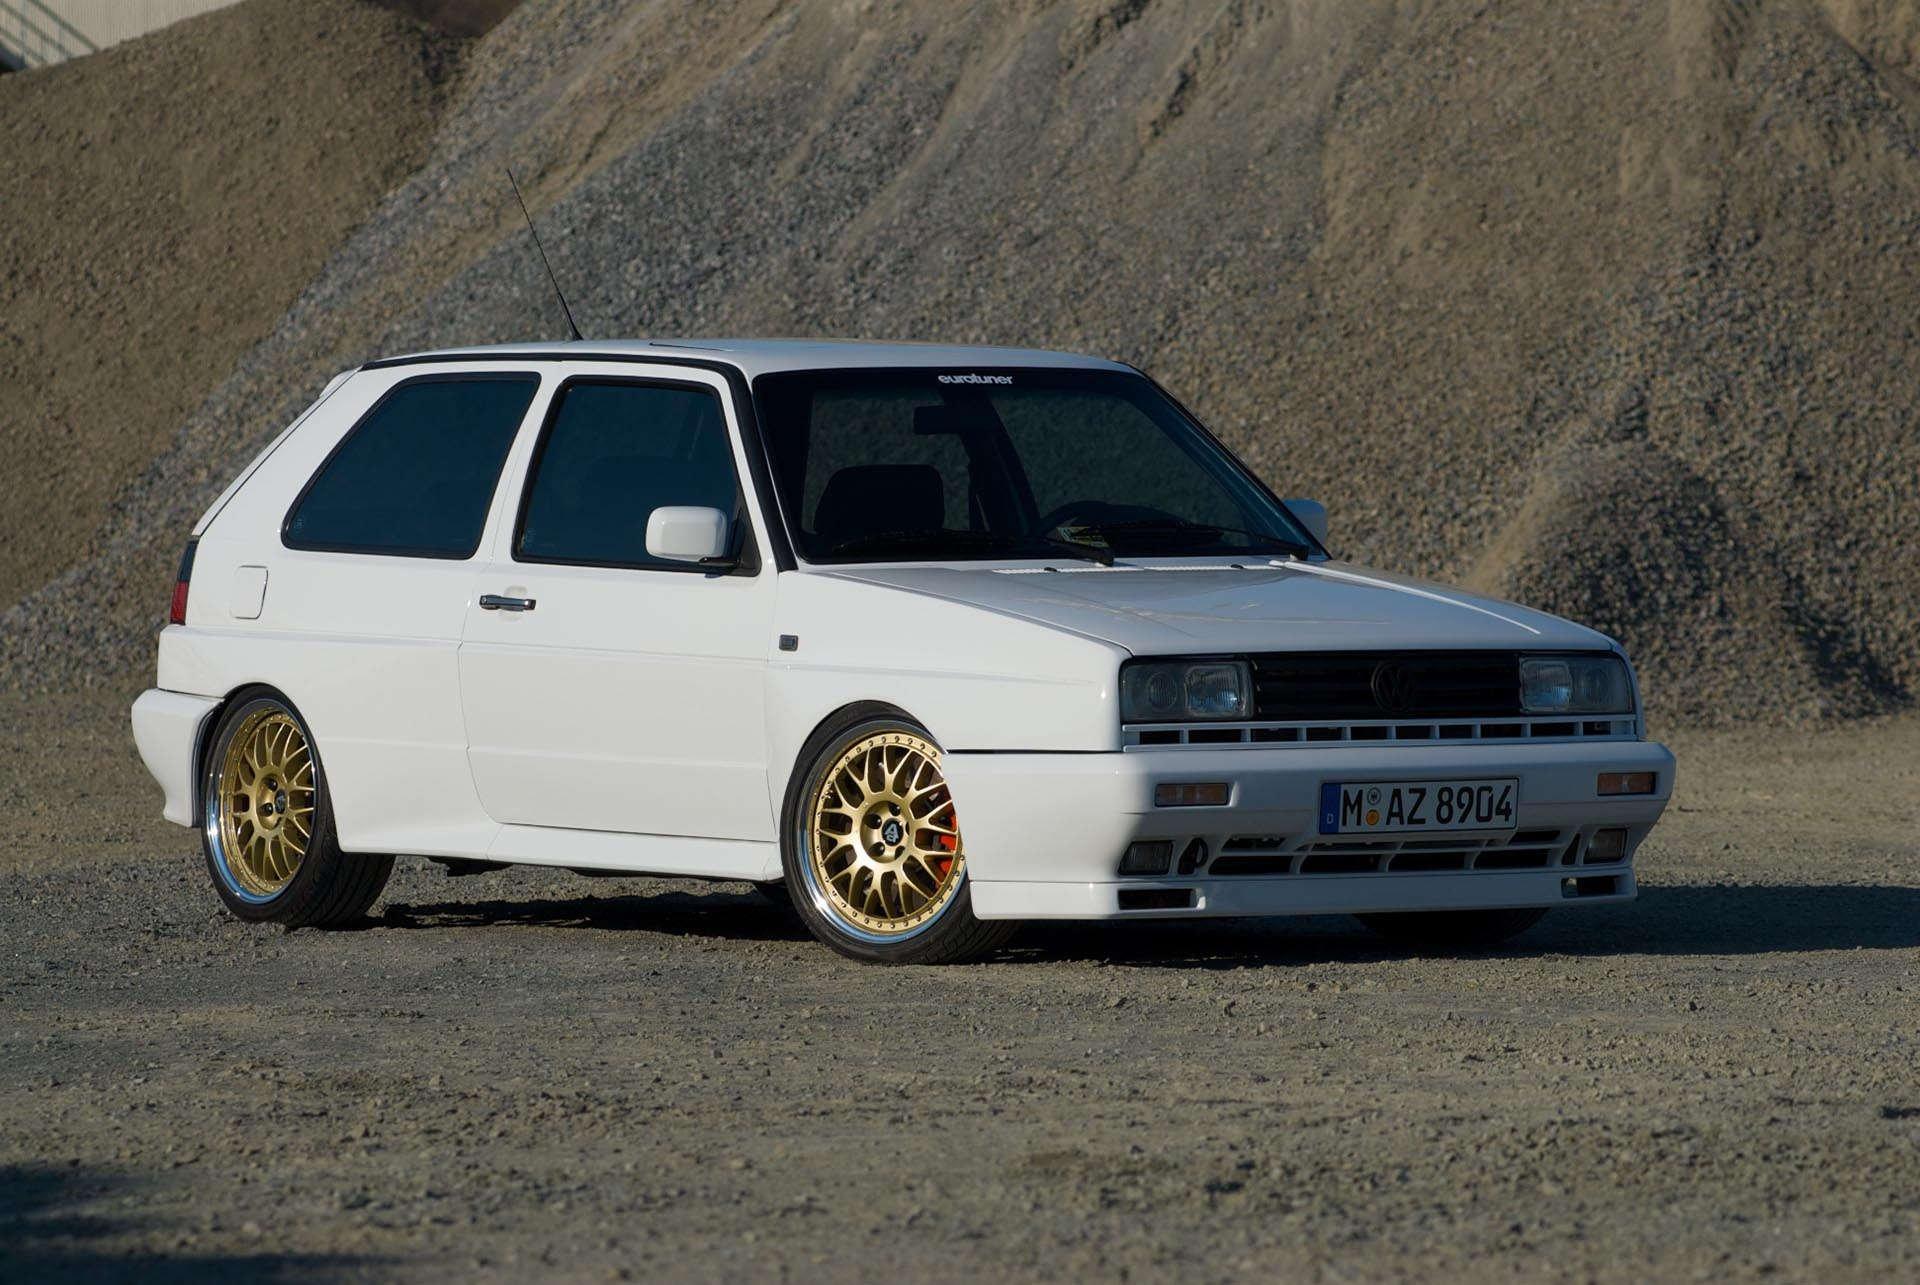 Volkswagen Mk2 Golf Rallye 24v VR6 White Front